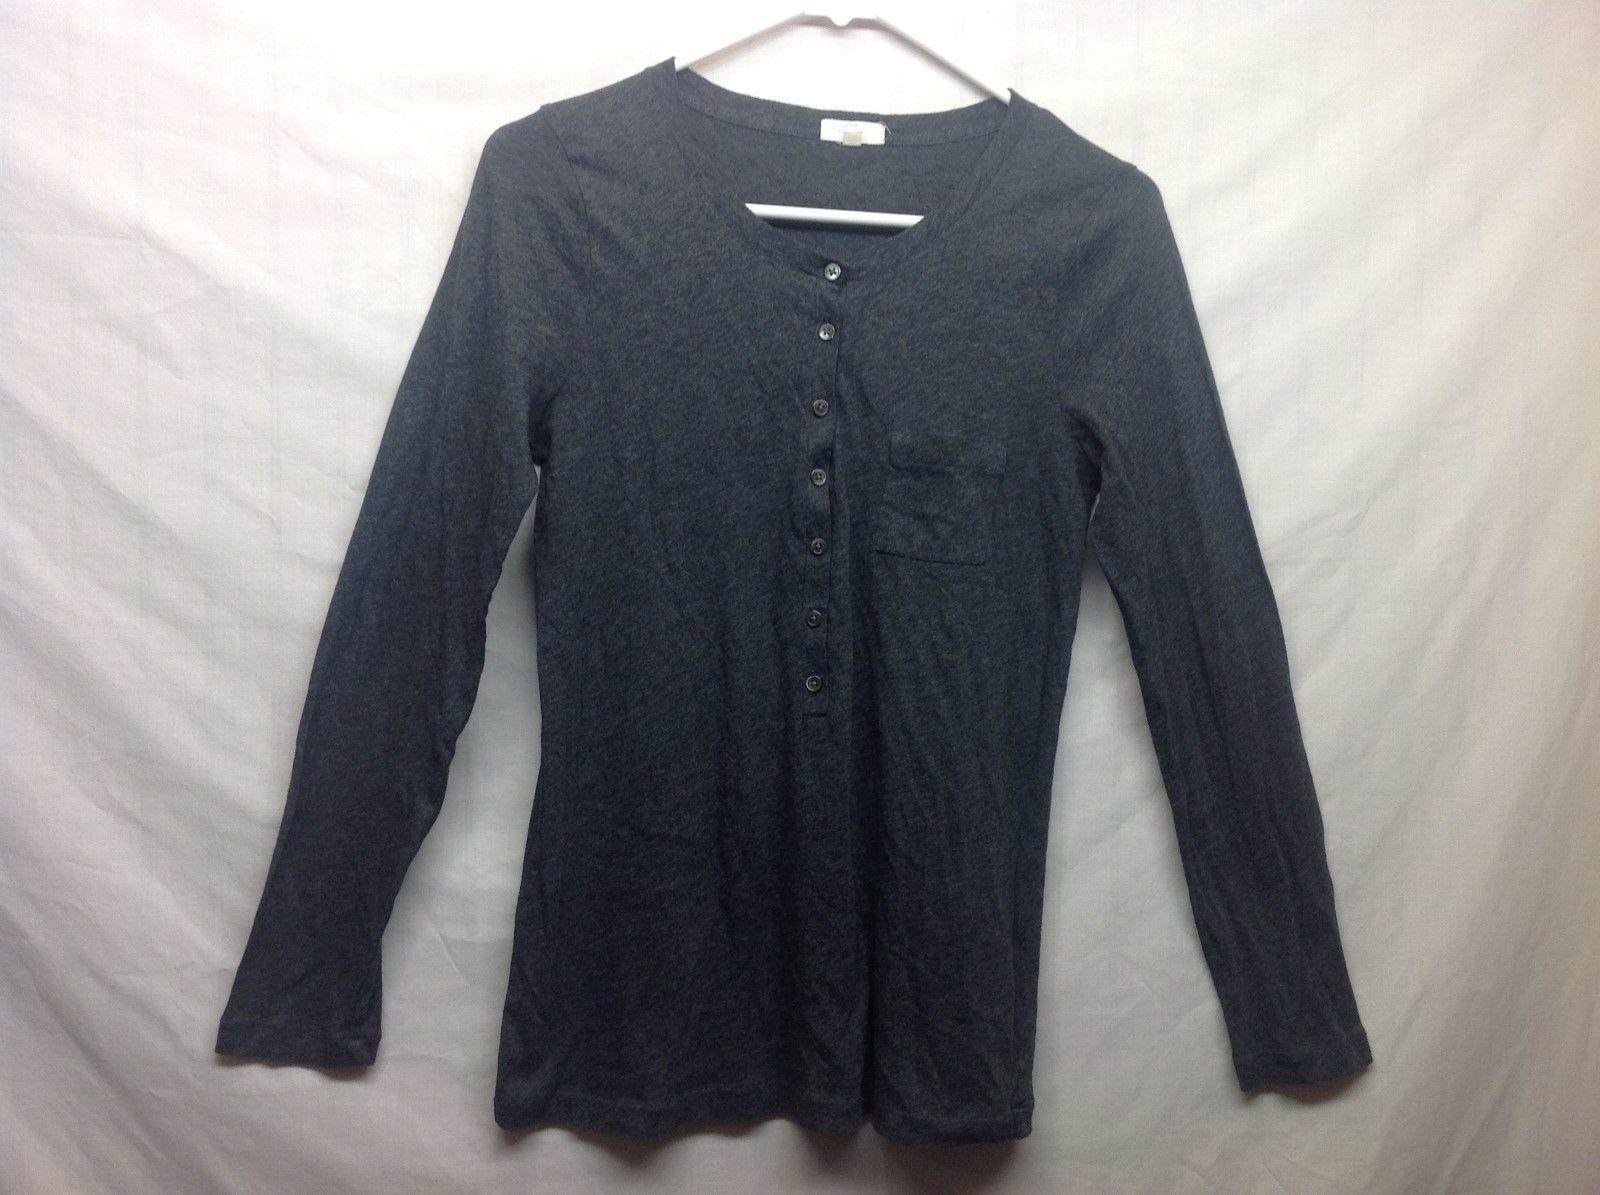 J. CREW Grey Button Up Pullover Long Sleeve Tissue Tee POLO Sz S